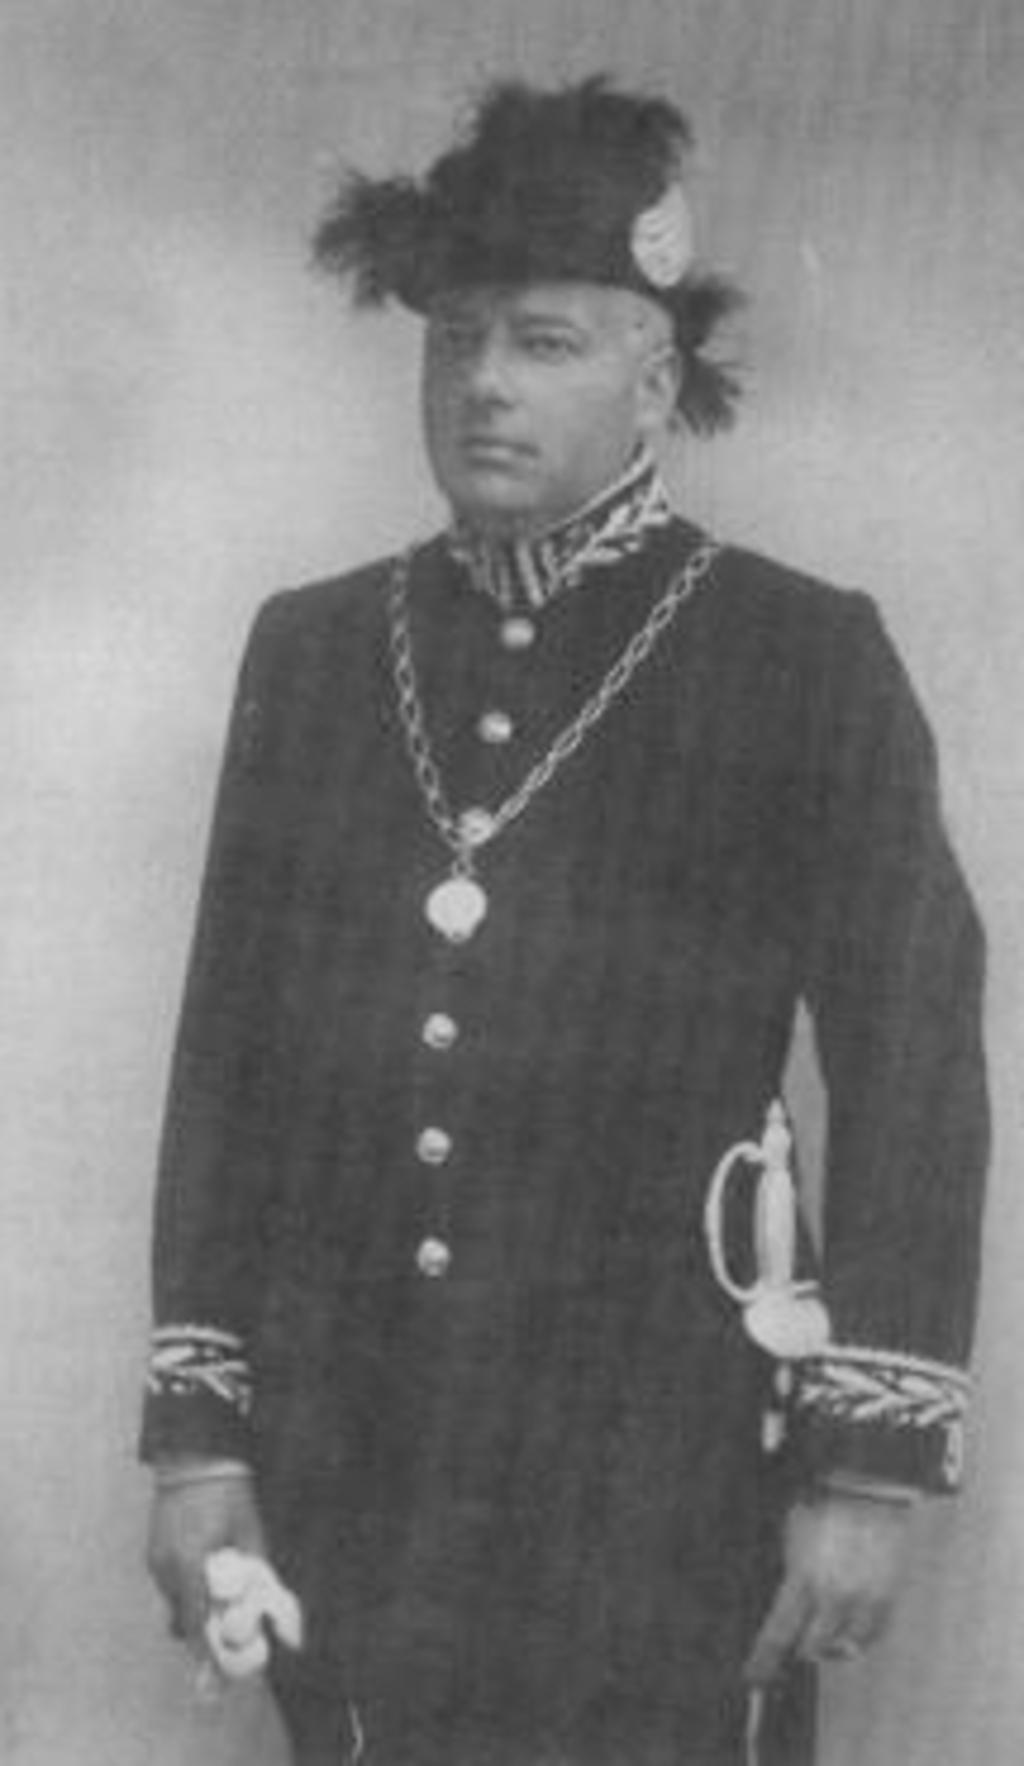 <p>Burgemeester Straman in vol ornaat. (1920-1938)</p> <p>Archief Historische Vereniging Wolfgerus van Amstel.</p> © BDU media